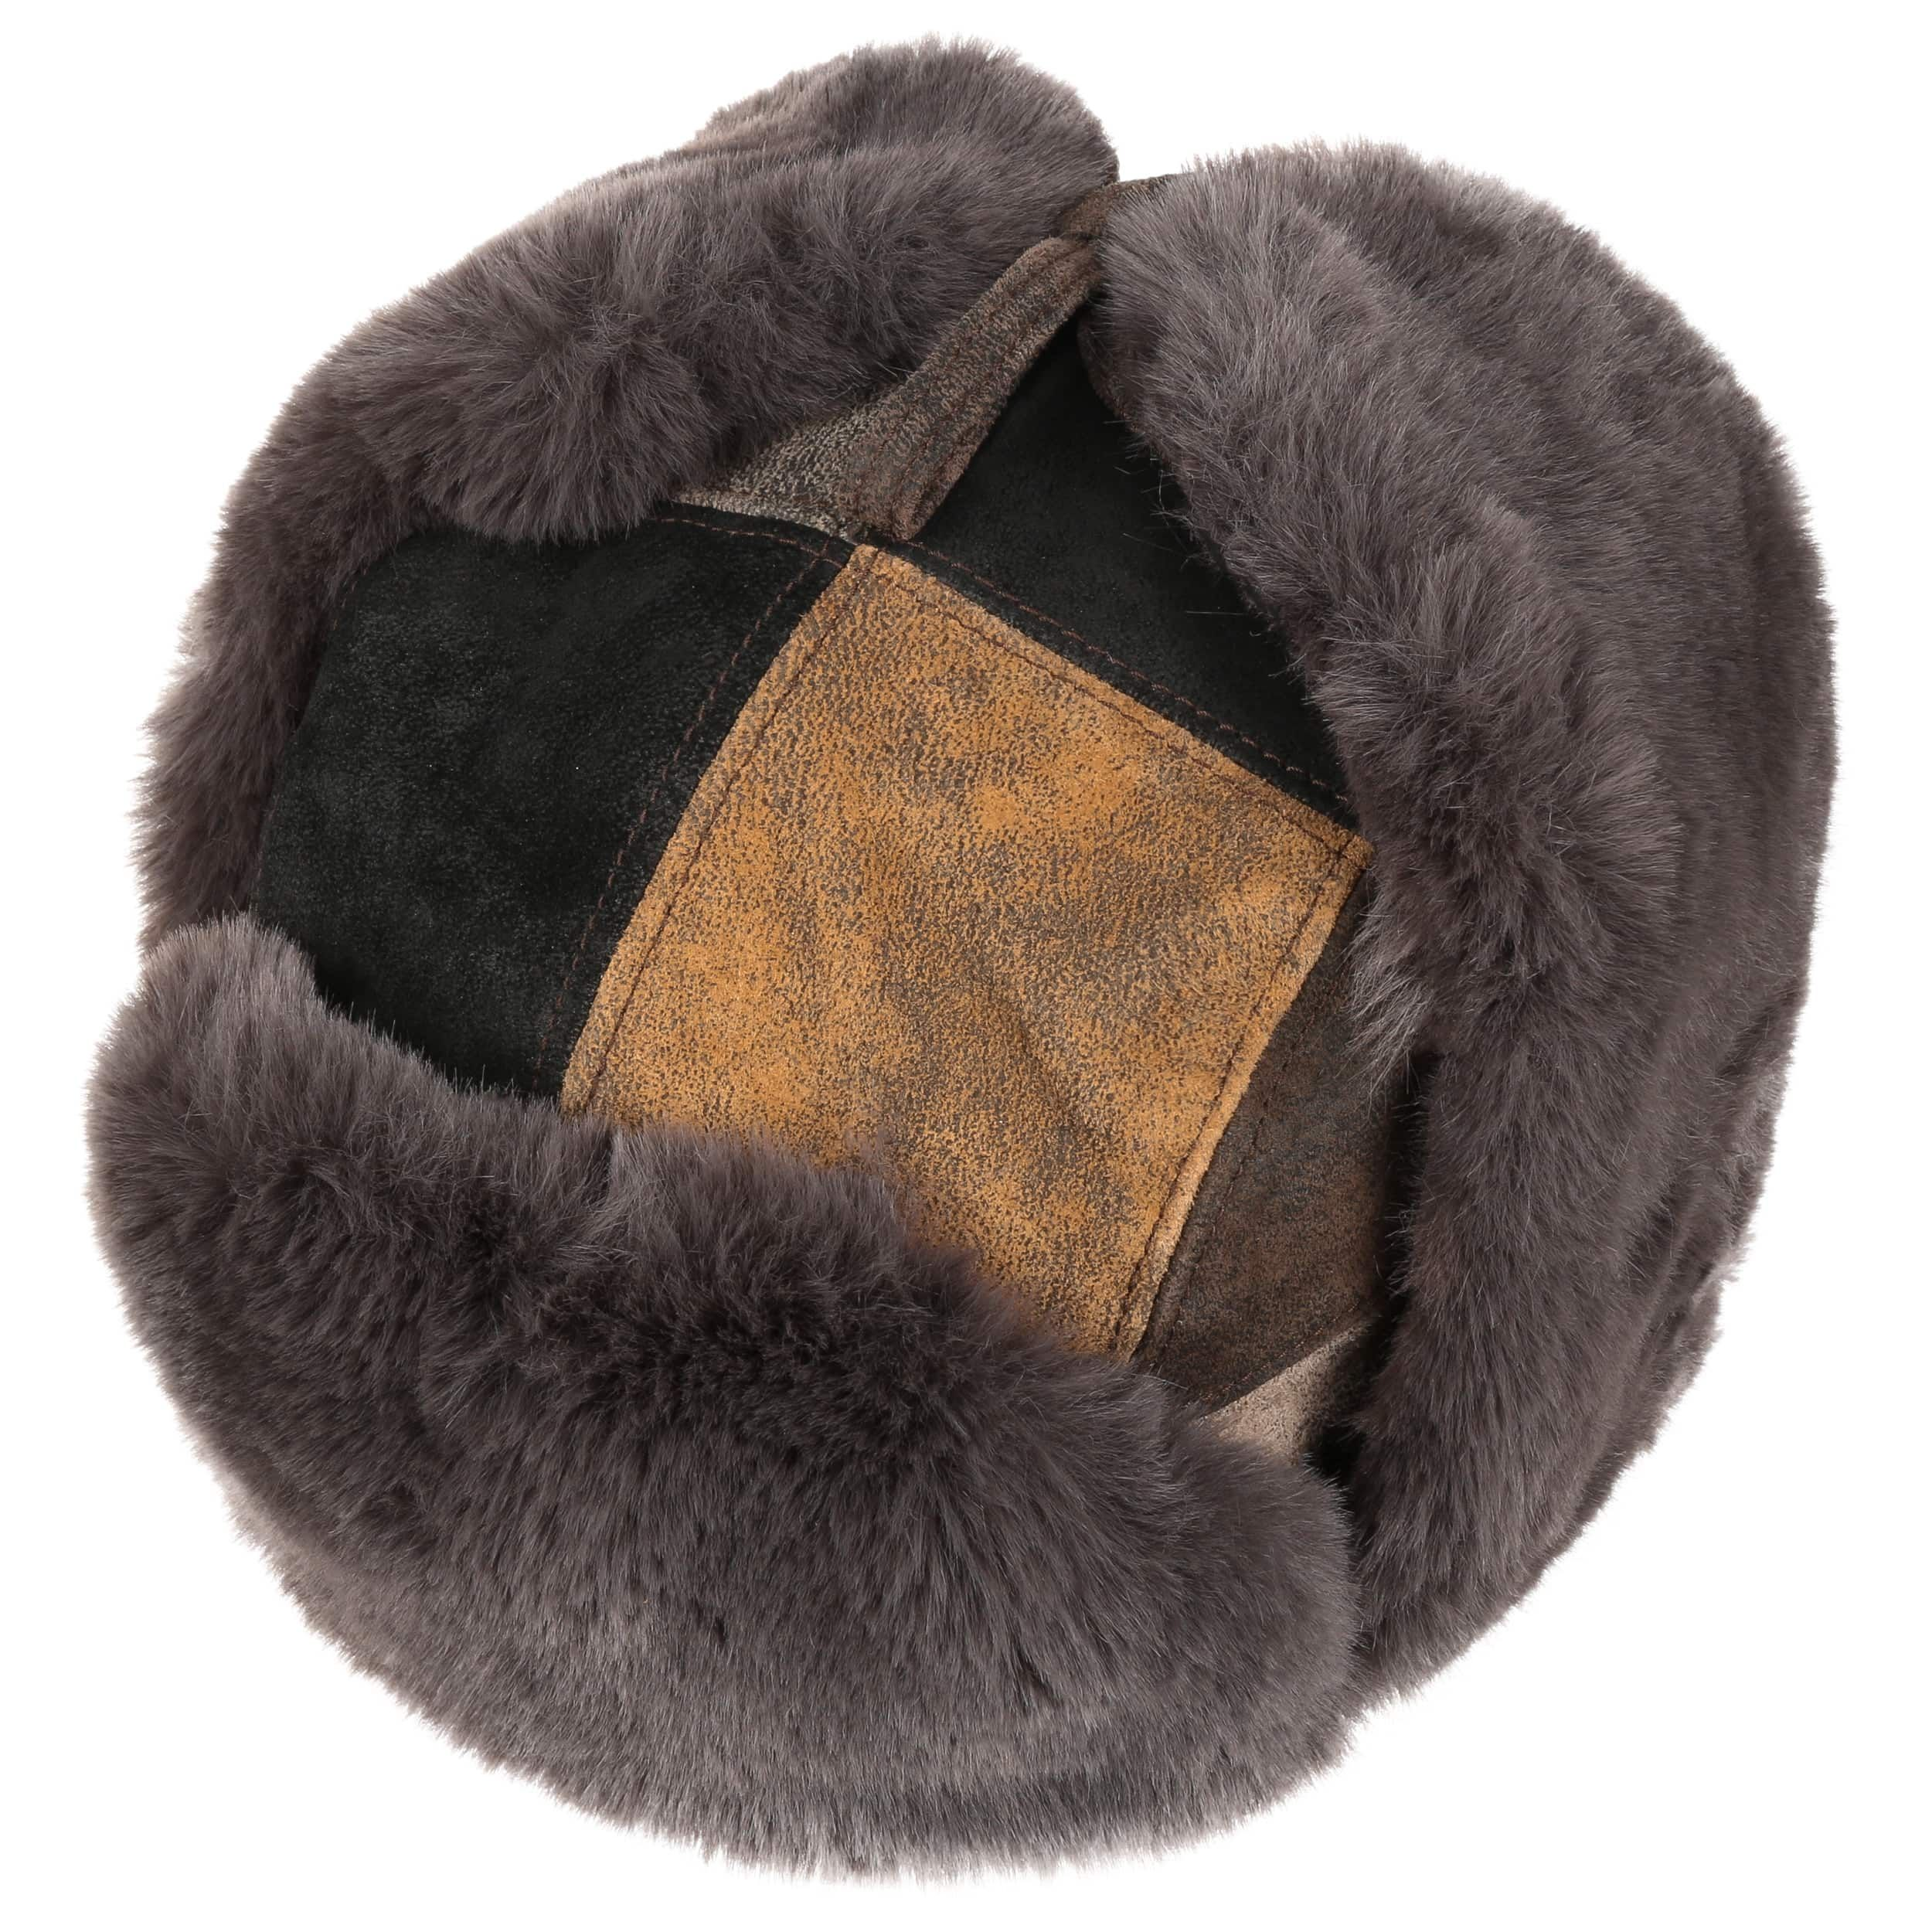 Chapka Pigskin Patchwork marron-noir